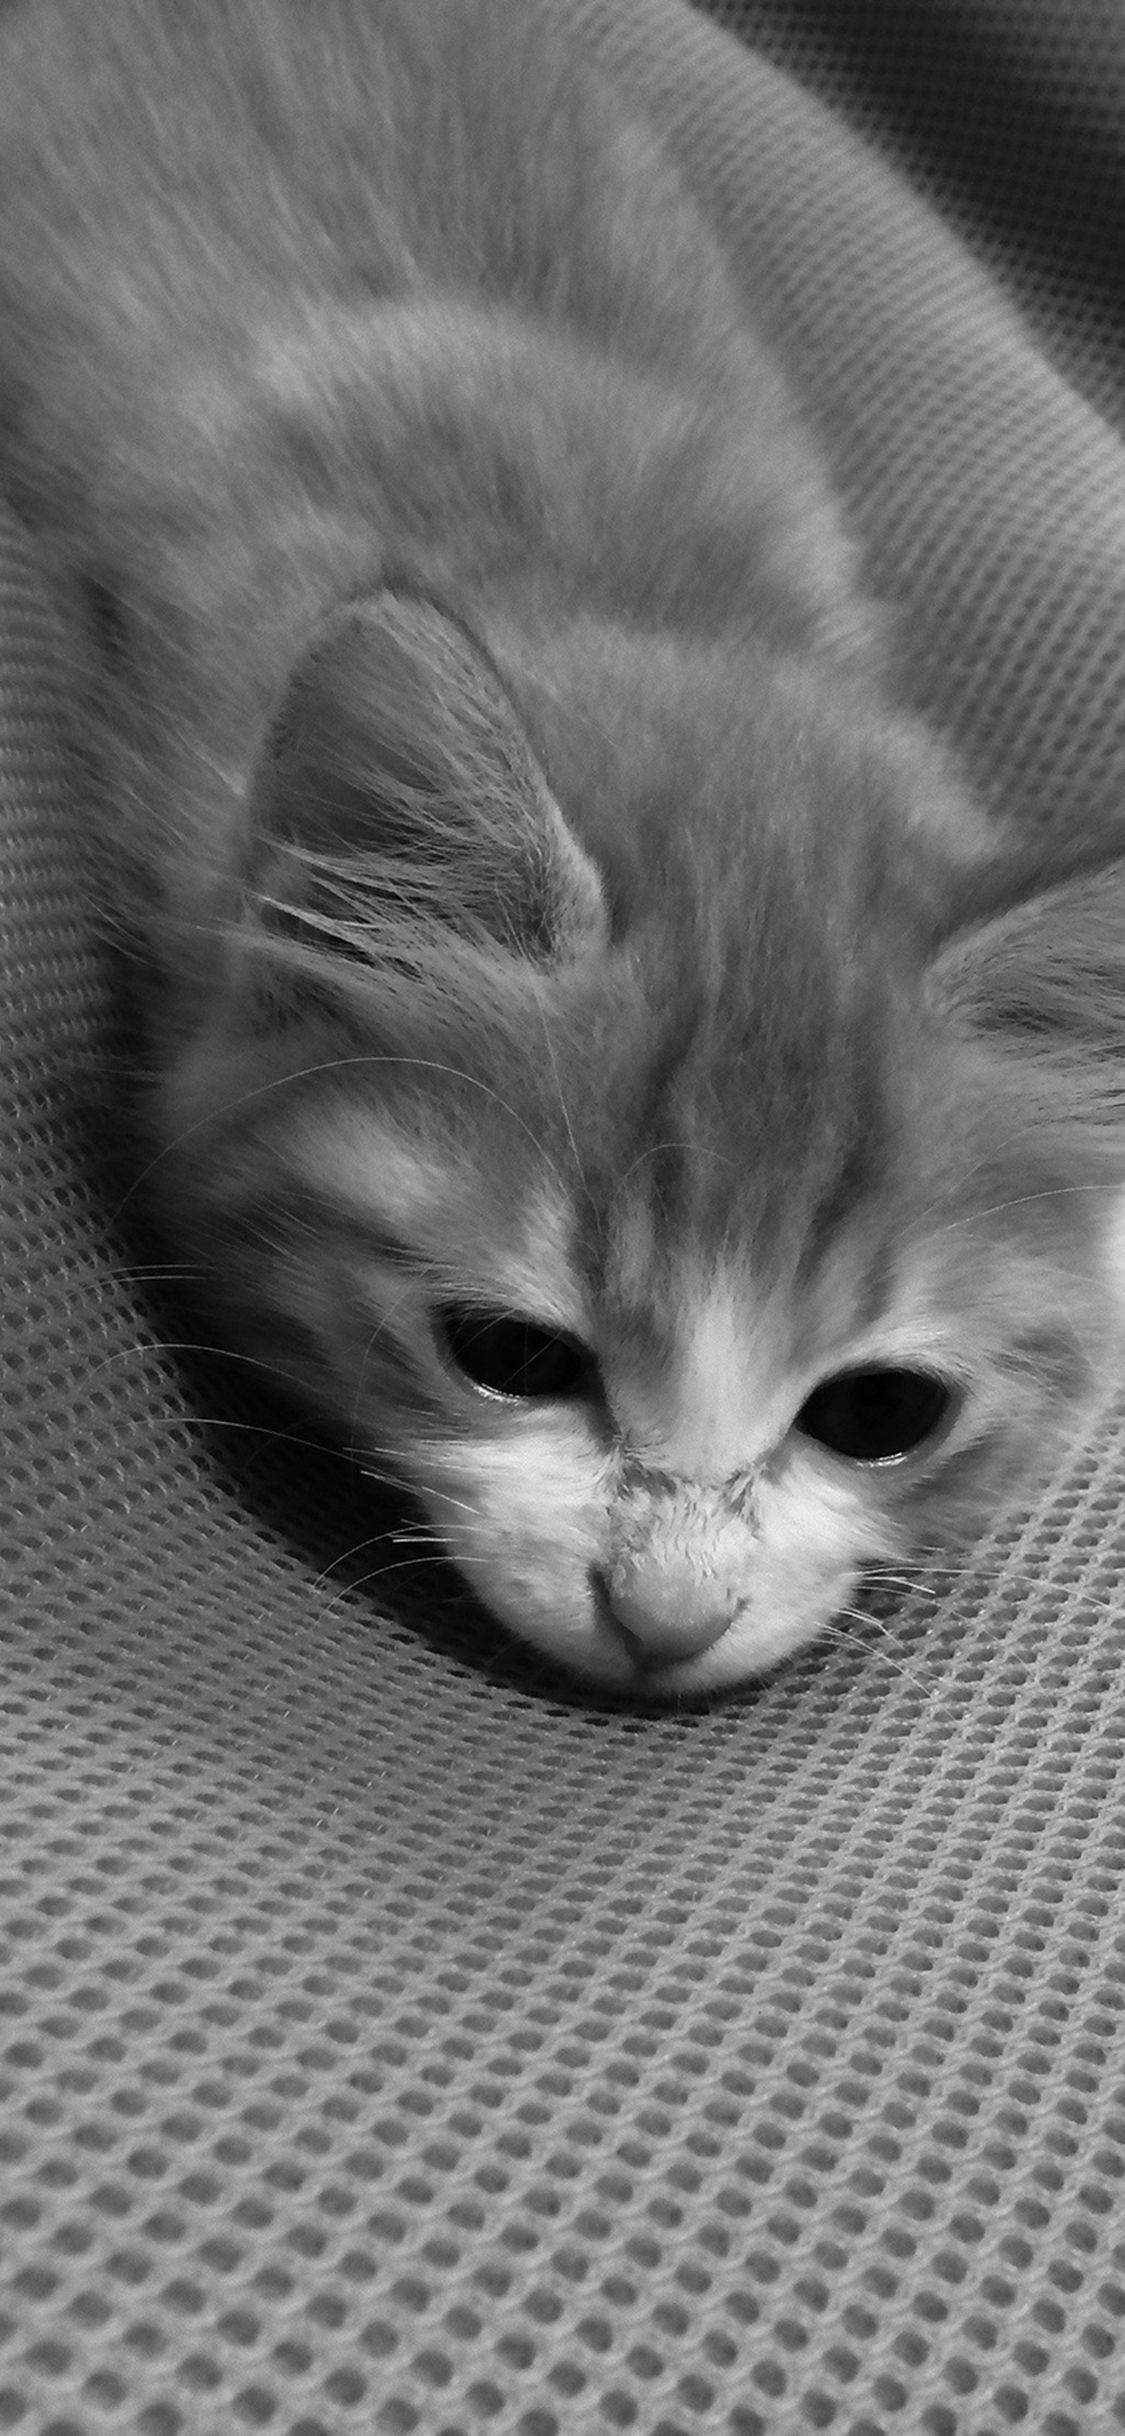 Cute Cat Pet Animal Dark Bed At Ease Iphone X Wallpapers Cute